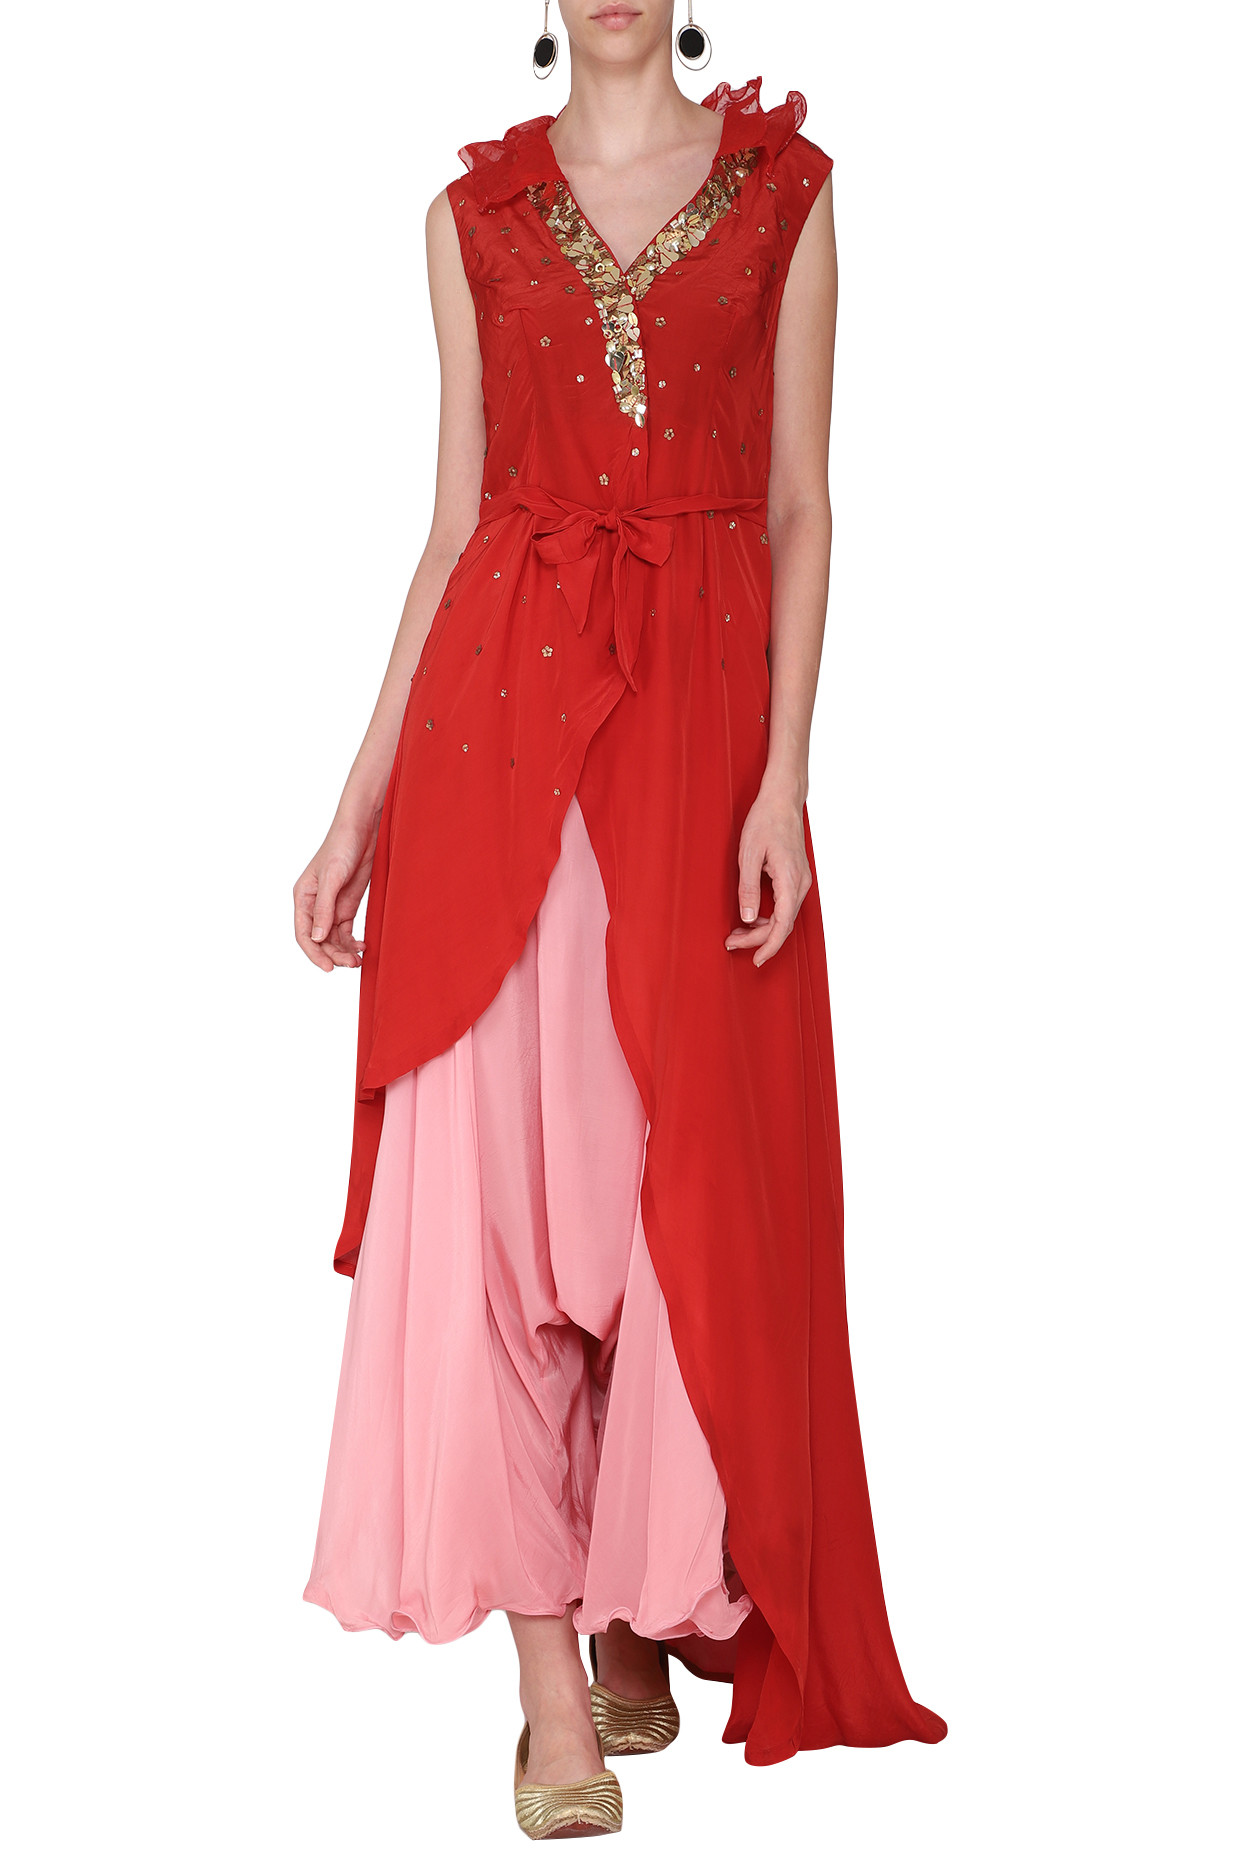 Red Embellished Tunic with Pink Drape Pants and Belt by Rishi & Vibhuti